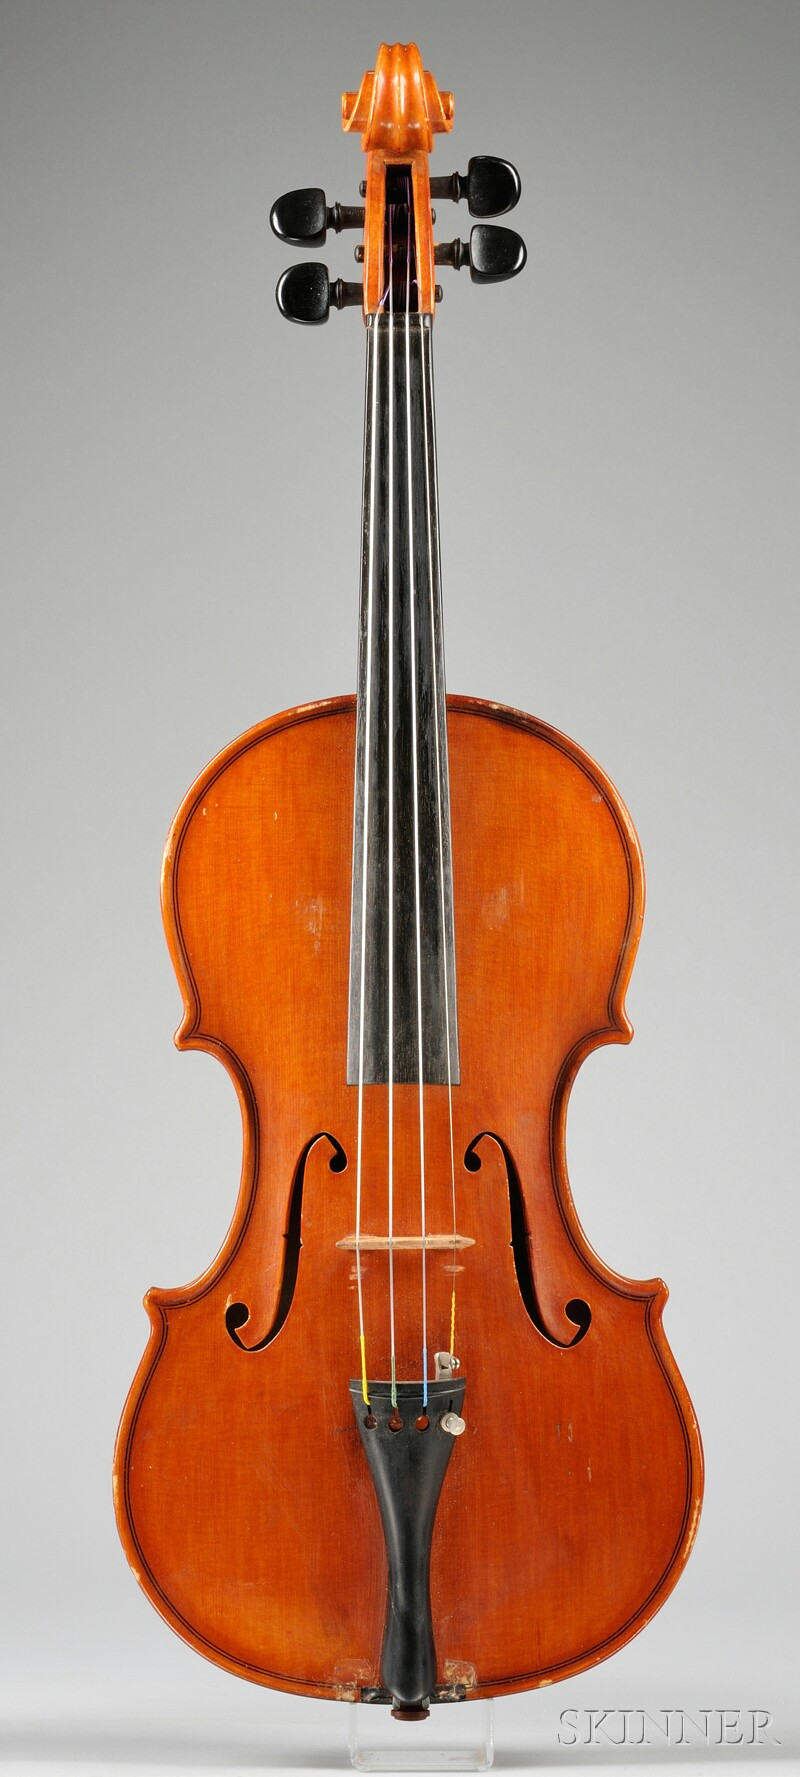 Modern Italian Violin, Paolo De Barbieri, Genoa, 1939